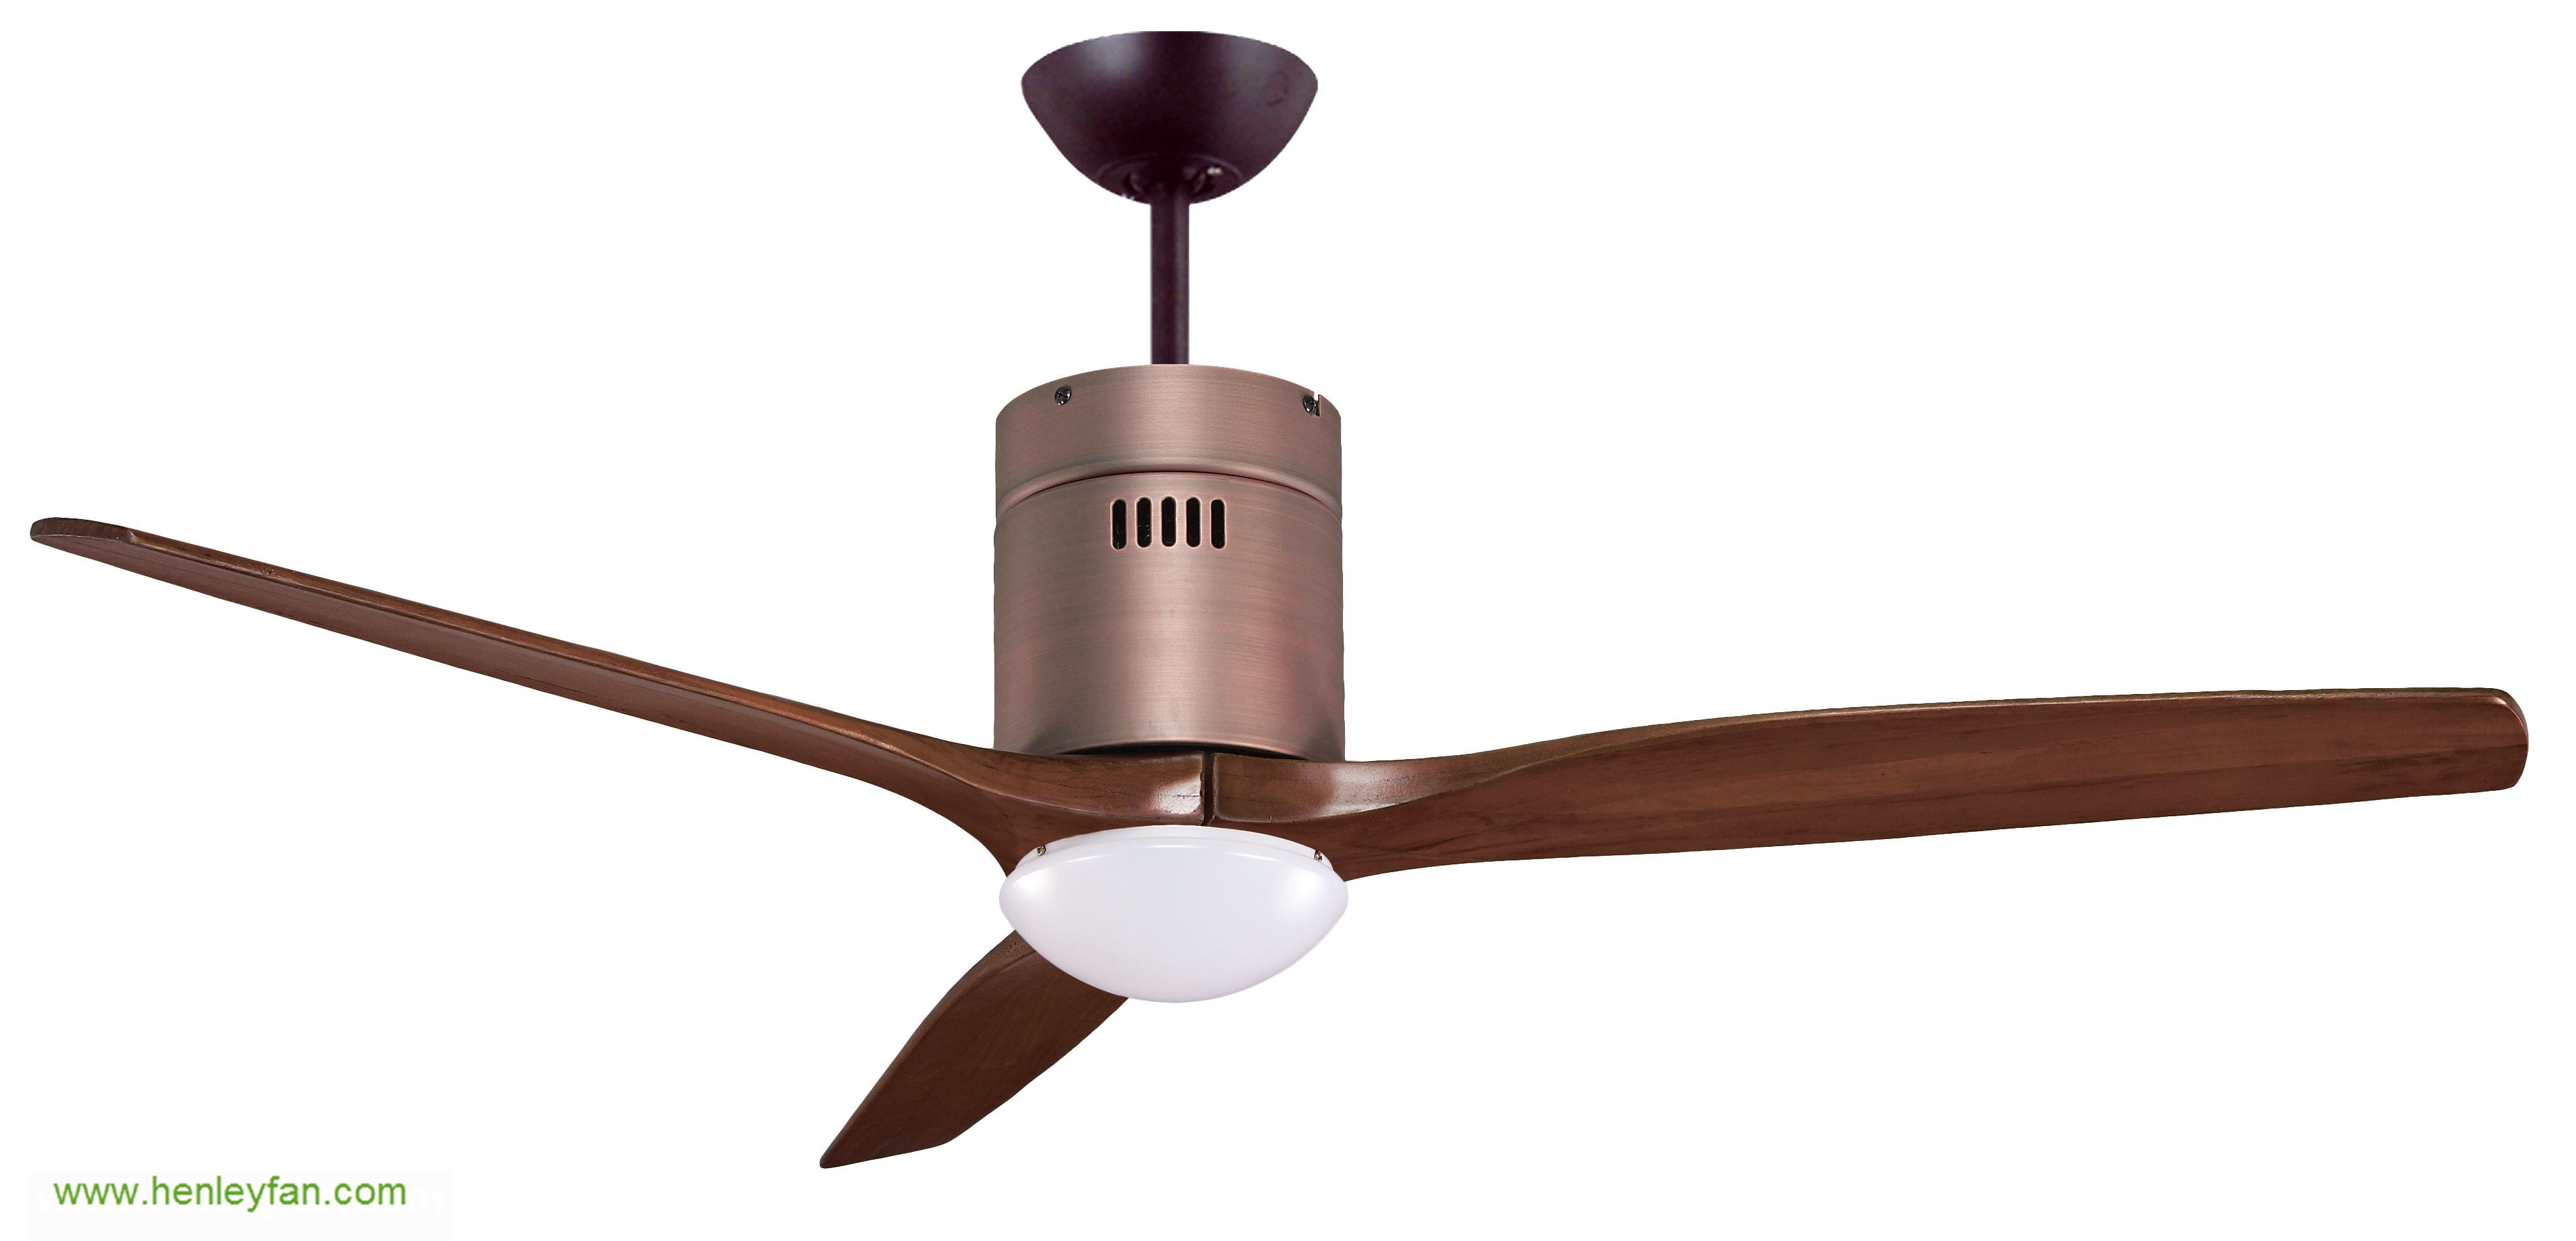 Mrken Pilot 3d Designer Low Energy Dc Ceiling Fan New Ceiling